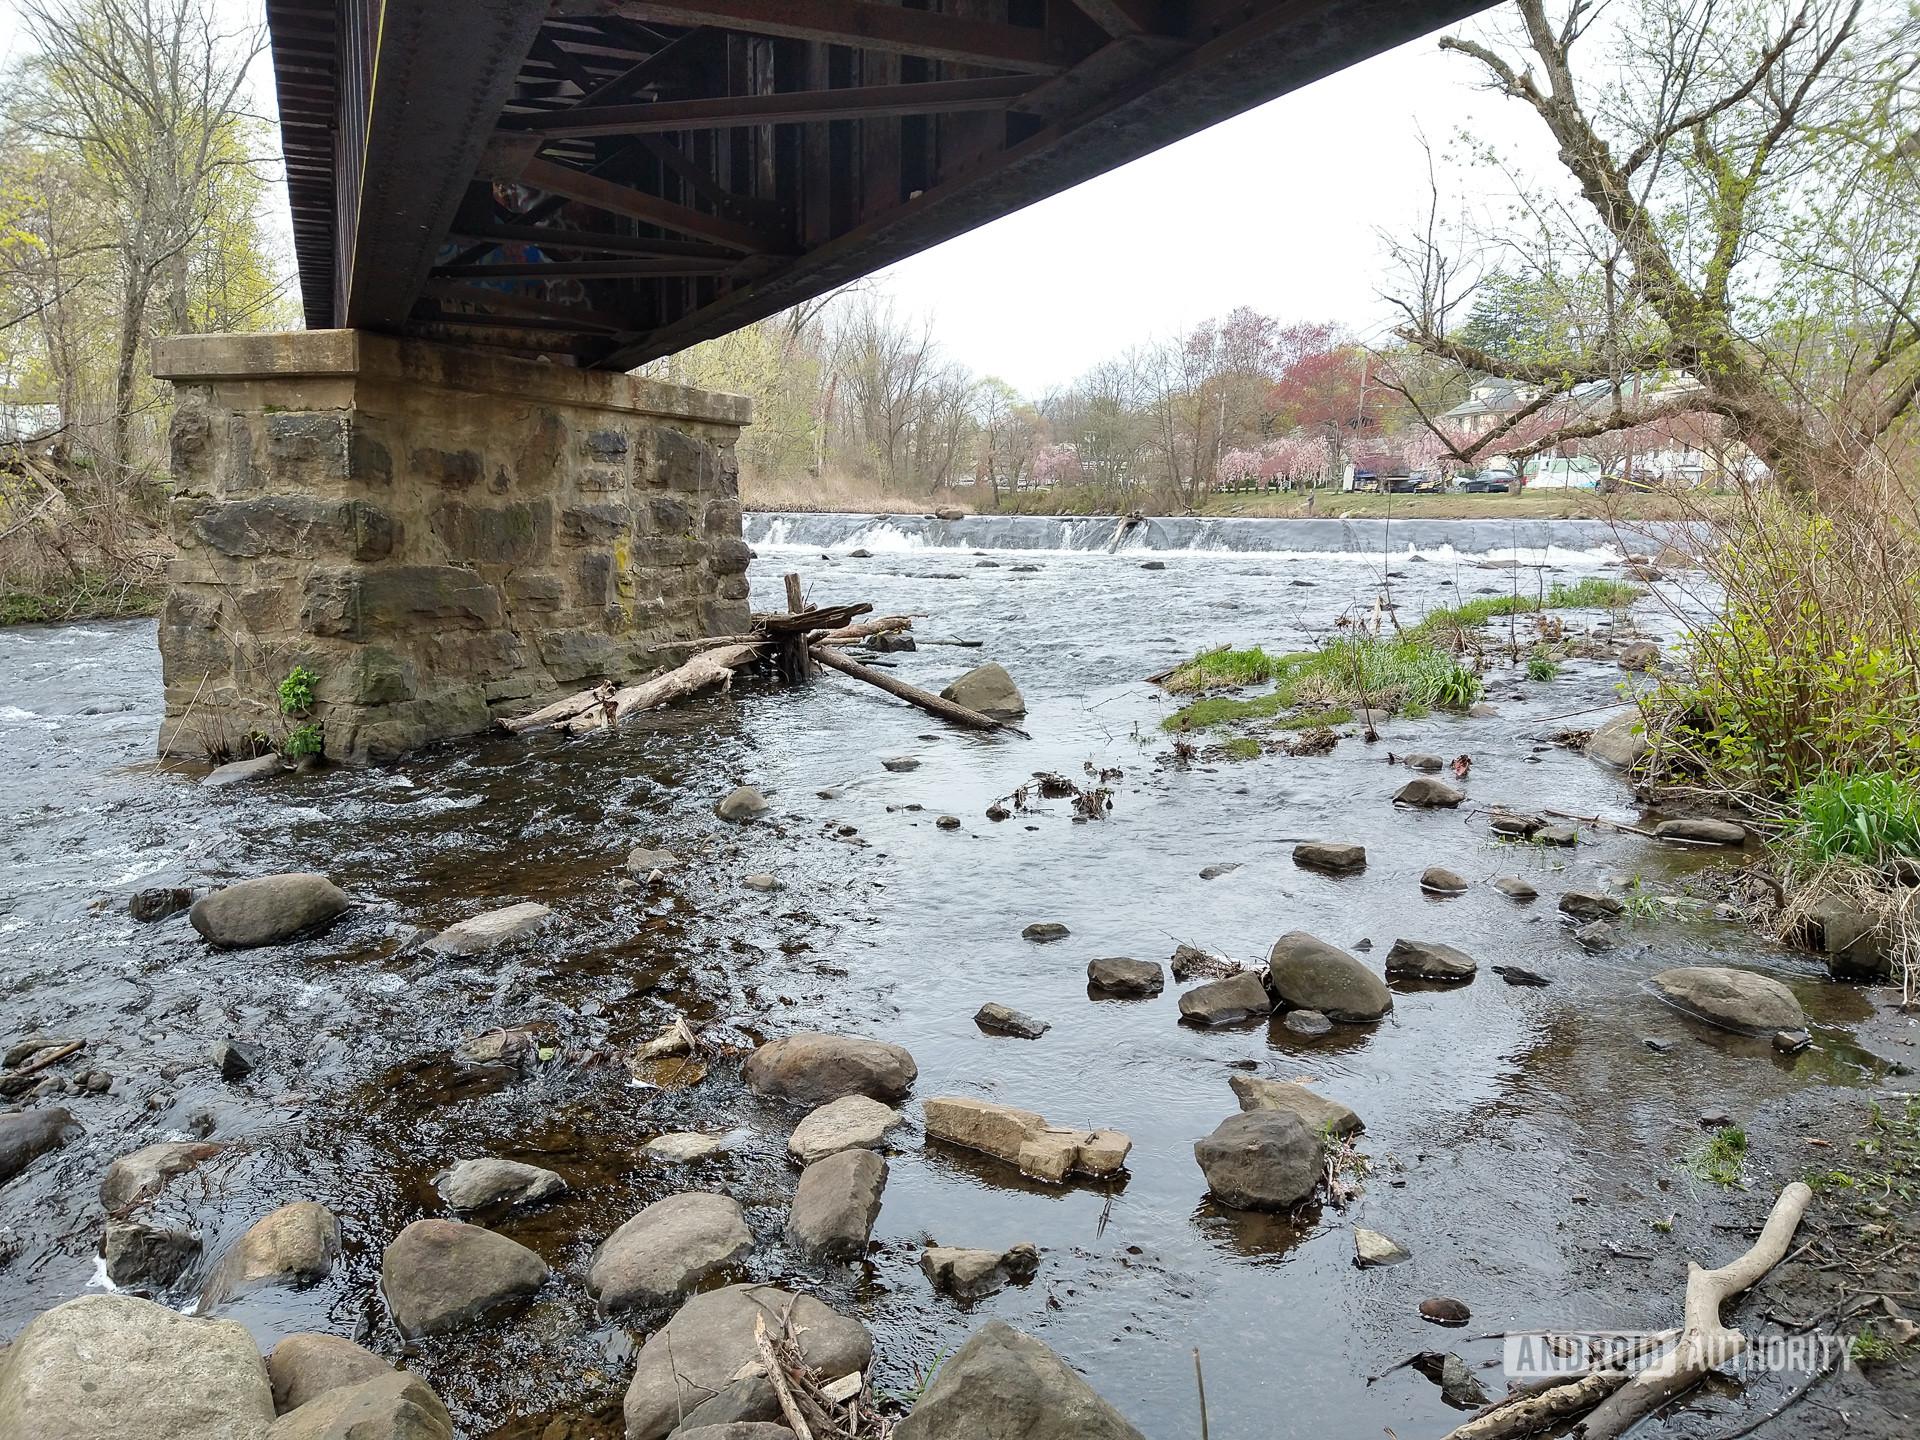 Moto G Stylus photo sample under the bridge